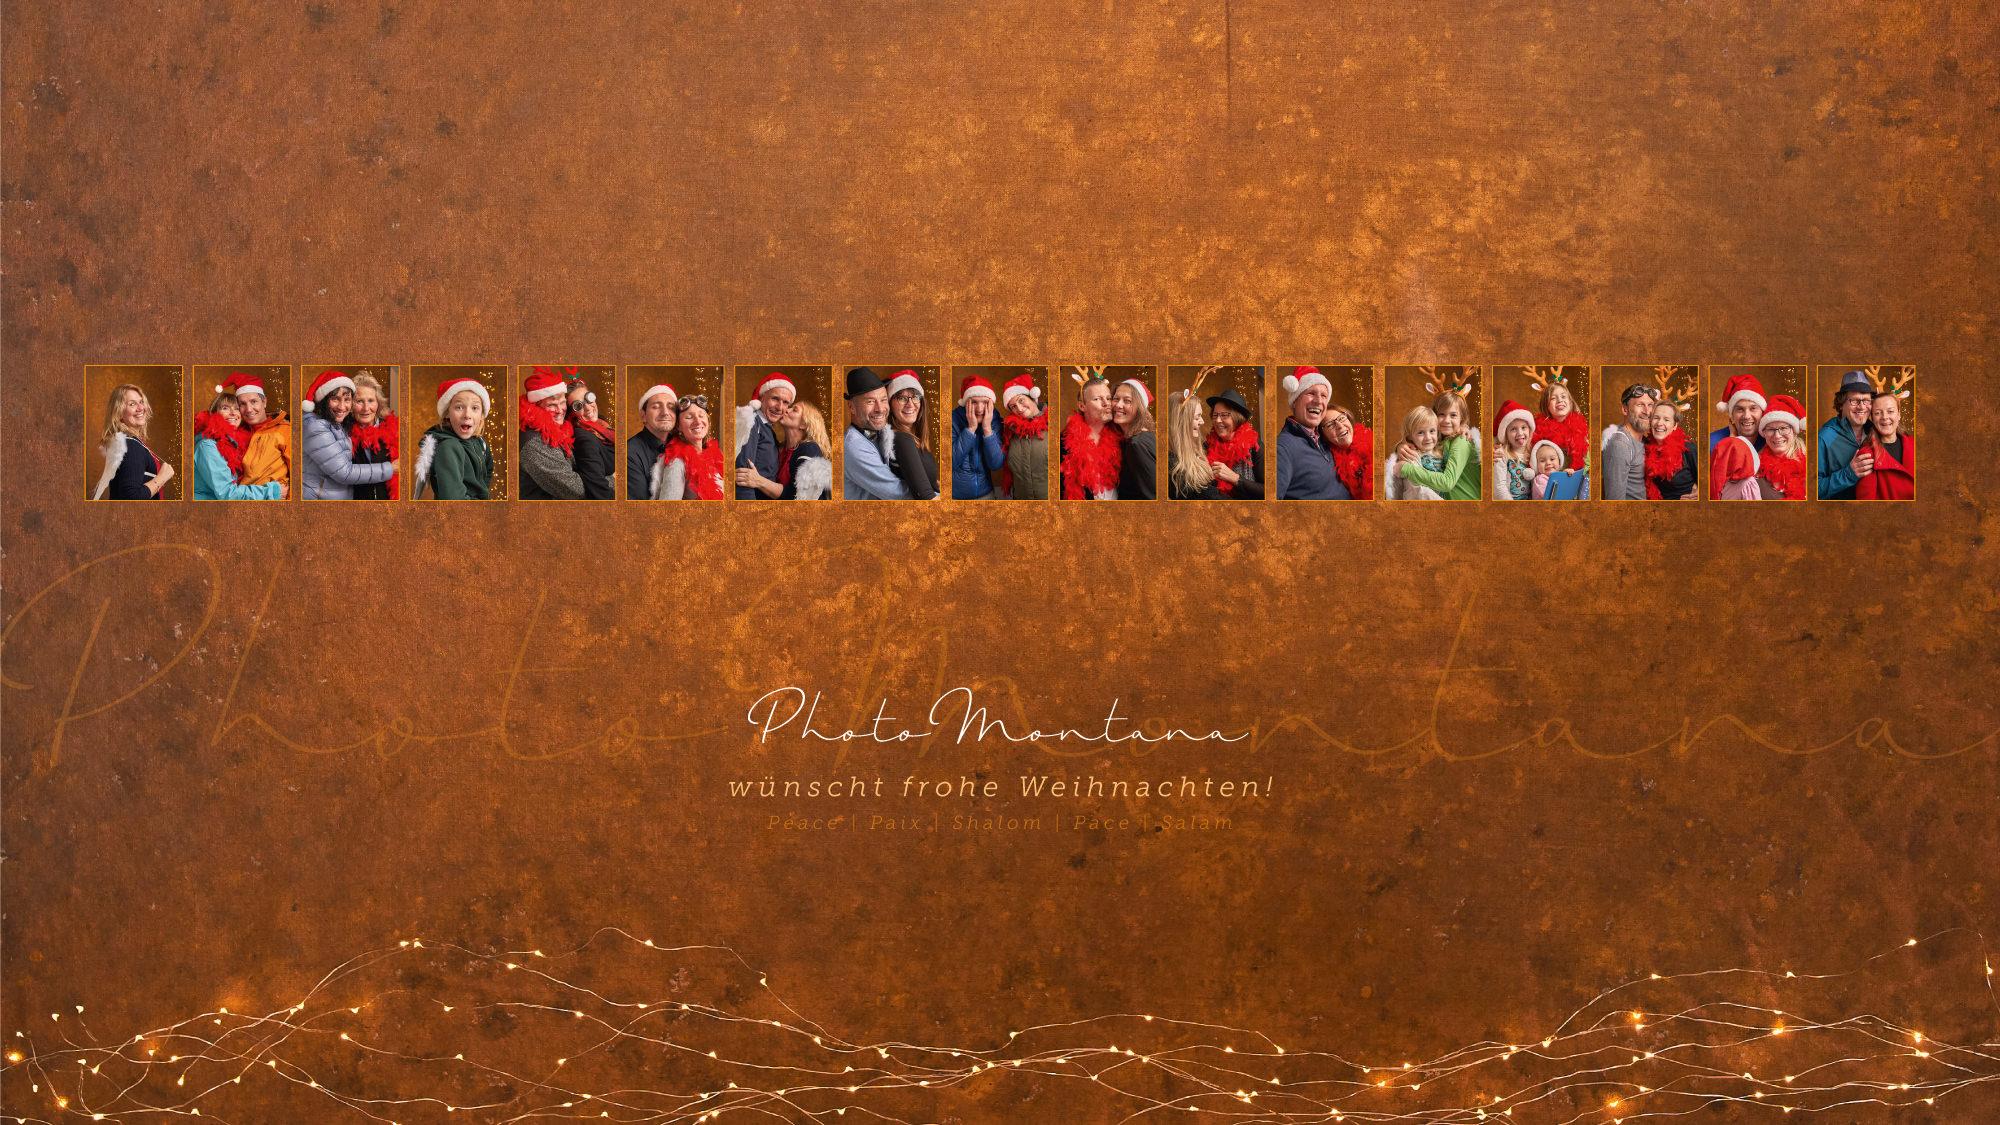 photo-montana-wuenscht-frohe-weihnachten